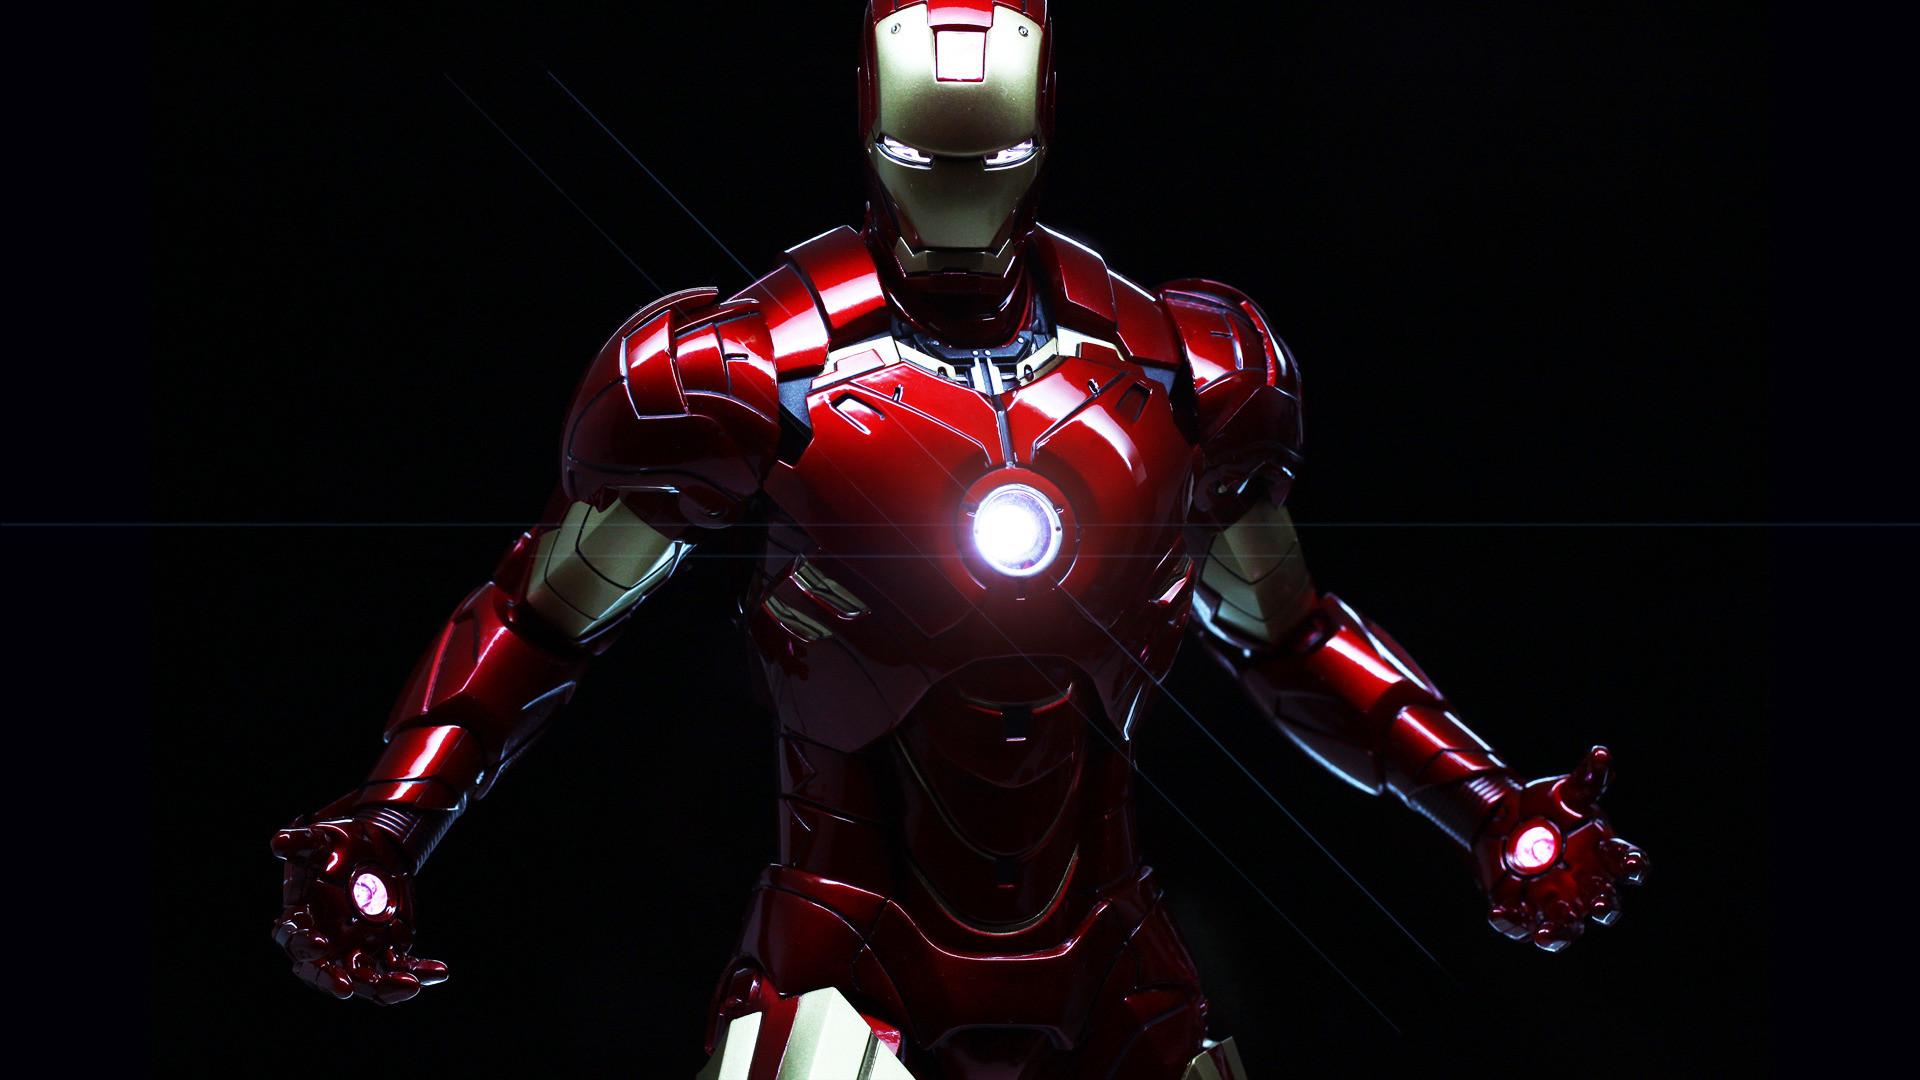 iron man background or wallpaper | Iron man wallpapers | High Definition  Wallpaper, wallpaper,